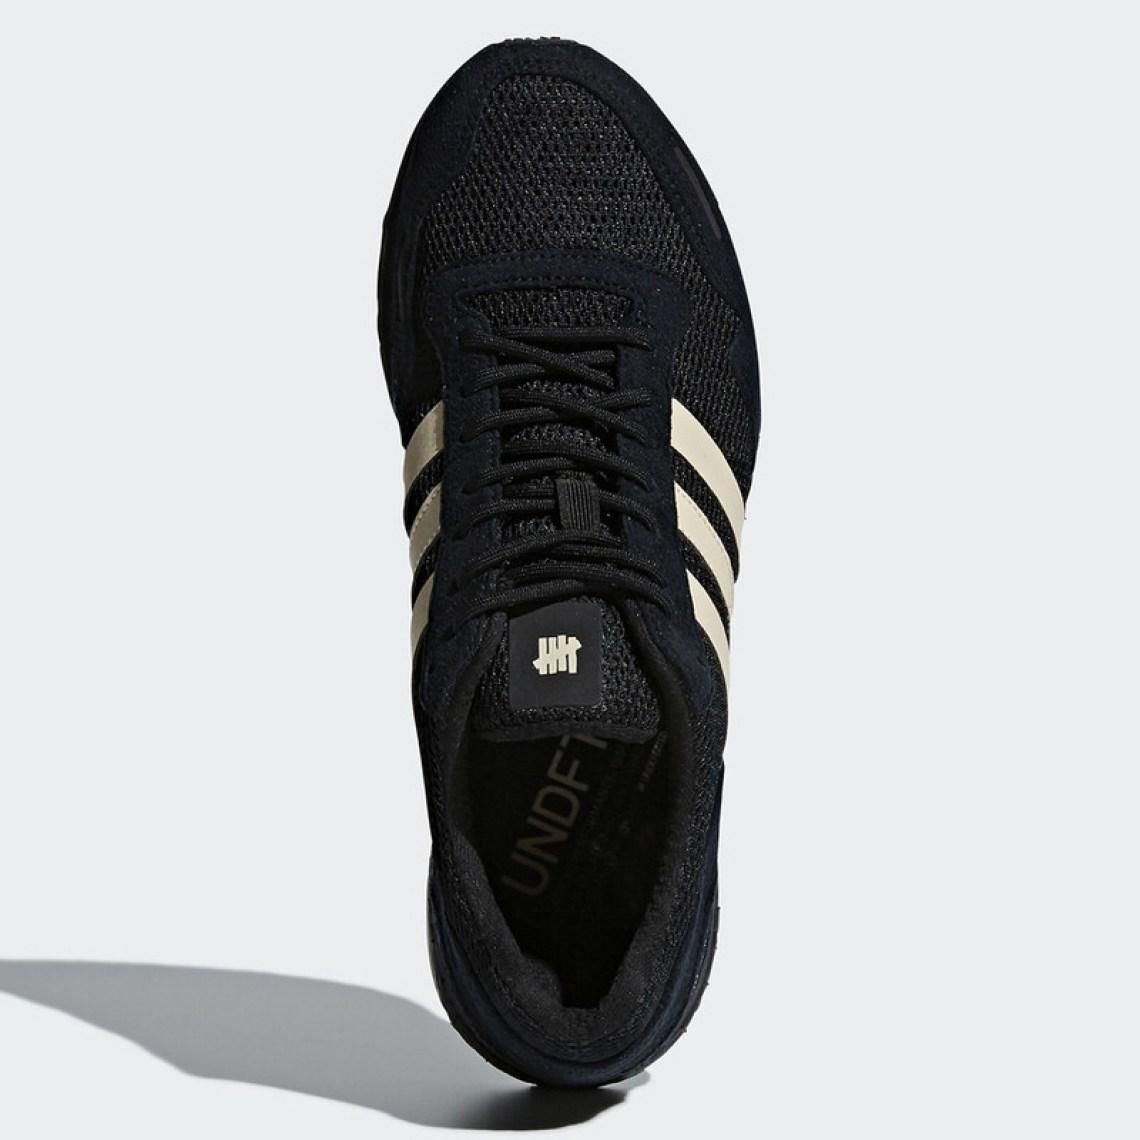 Undefeated x adidas adizero adios 3